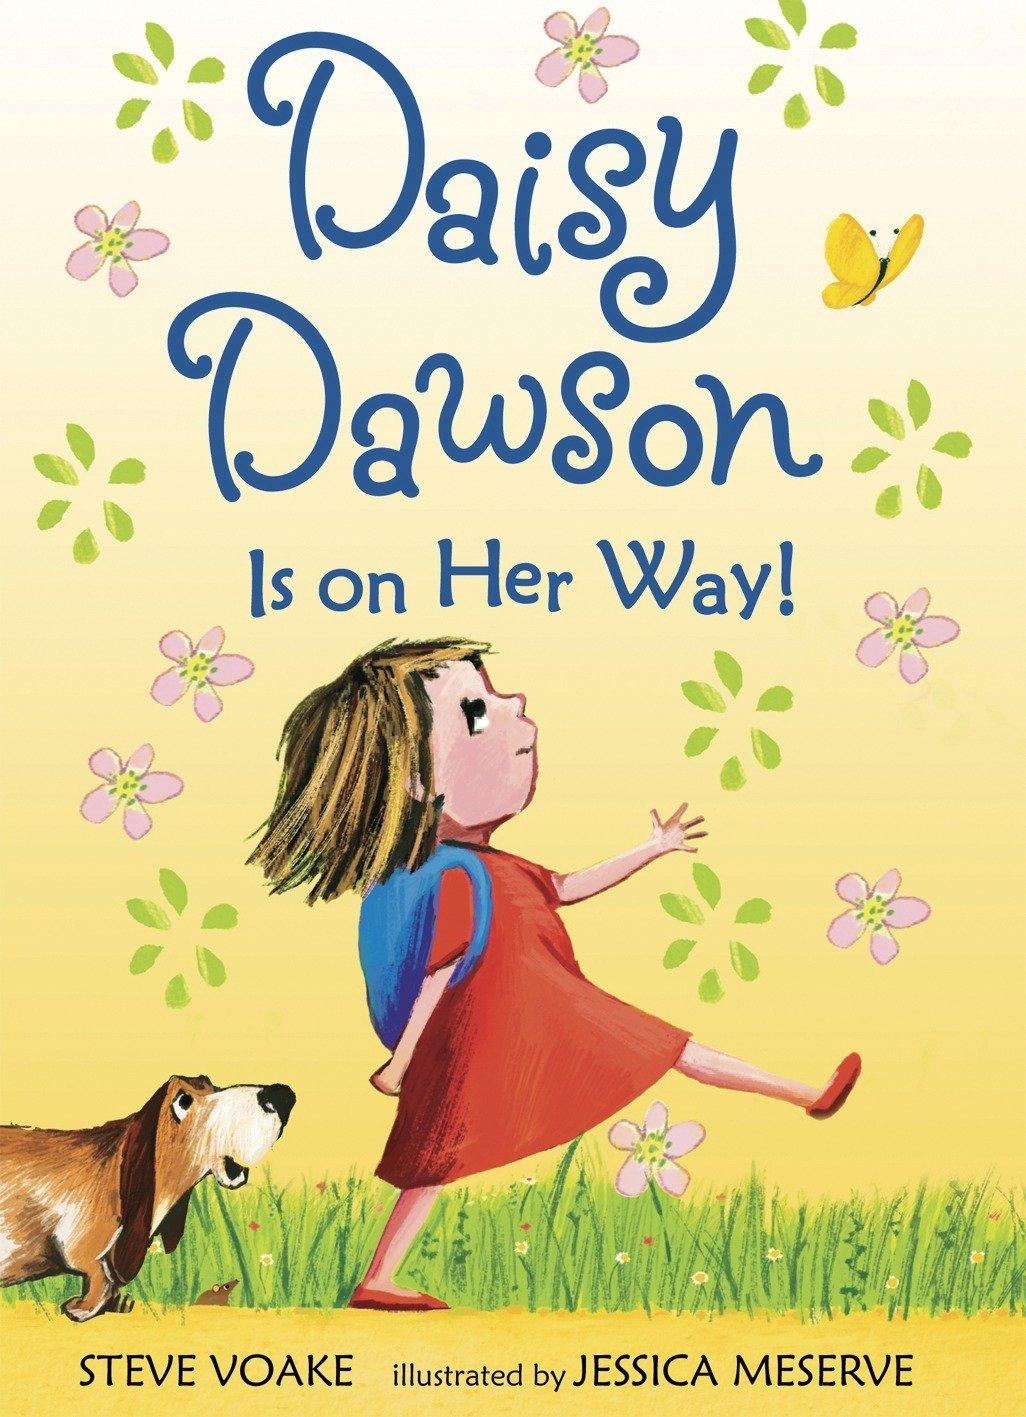 Amazon.com: Daisy Dawson Is on Her Way! (9780763642945): Steve Voake,  Jessica Meserve: Books